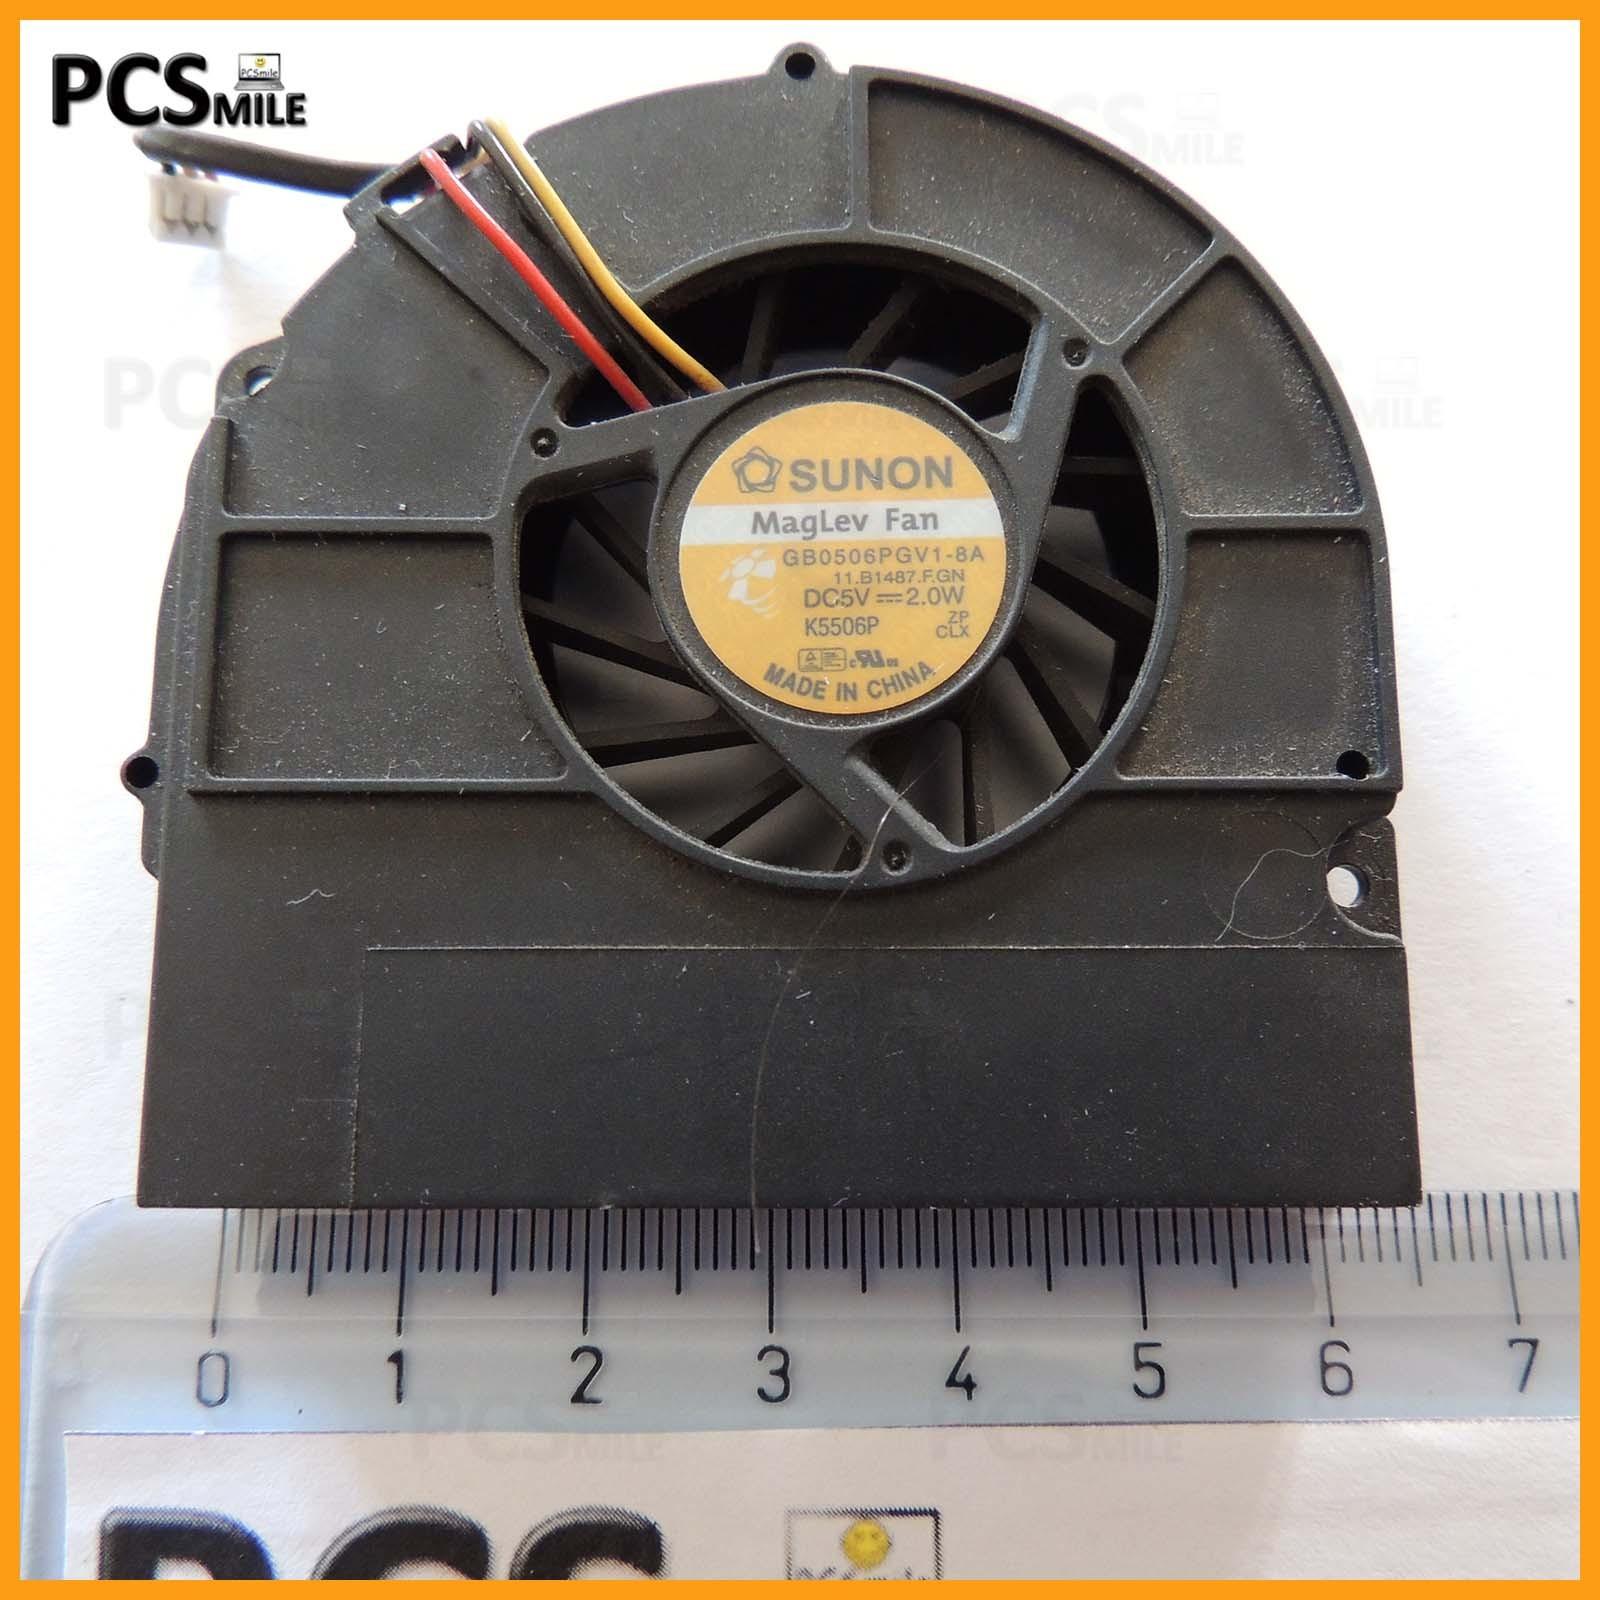 Ventola Acer Travelmate 4150 DL00 SUNNON GB0506PGV1-8A FAN